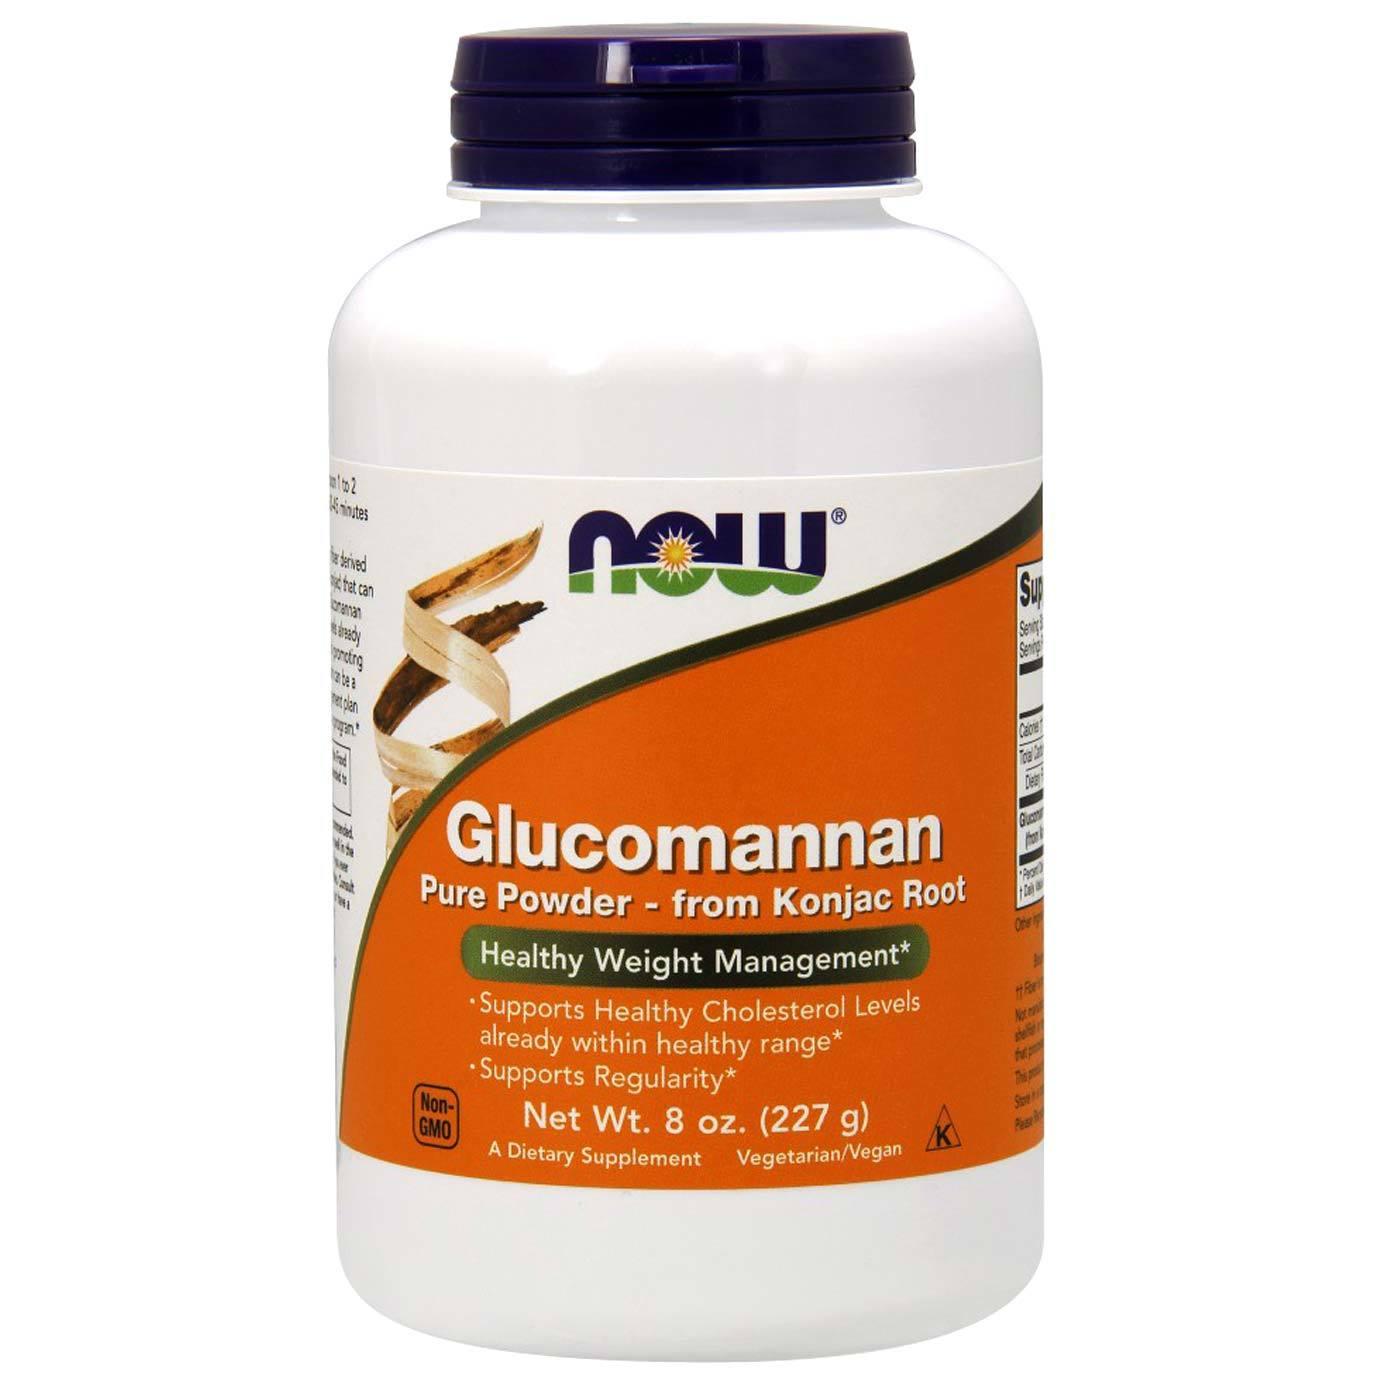 Glucomannan products